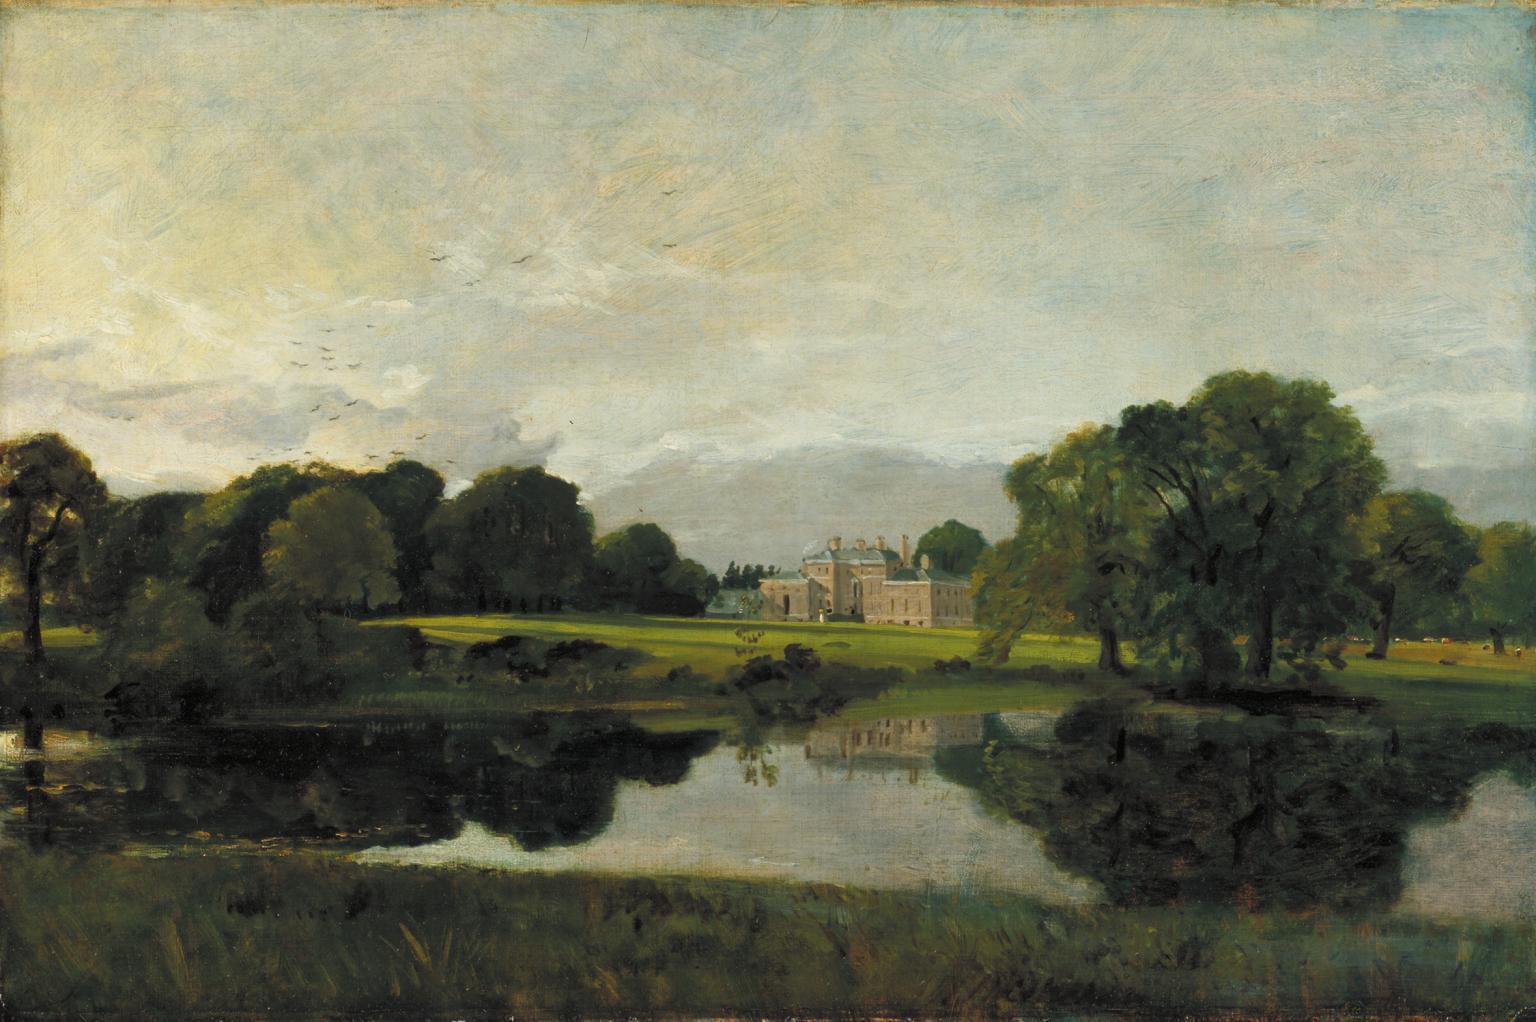 """Malvern Hall"" by John Constable (1809)"